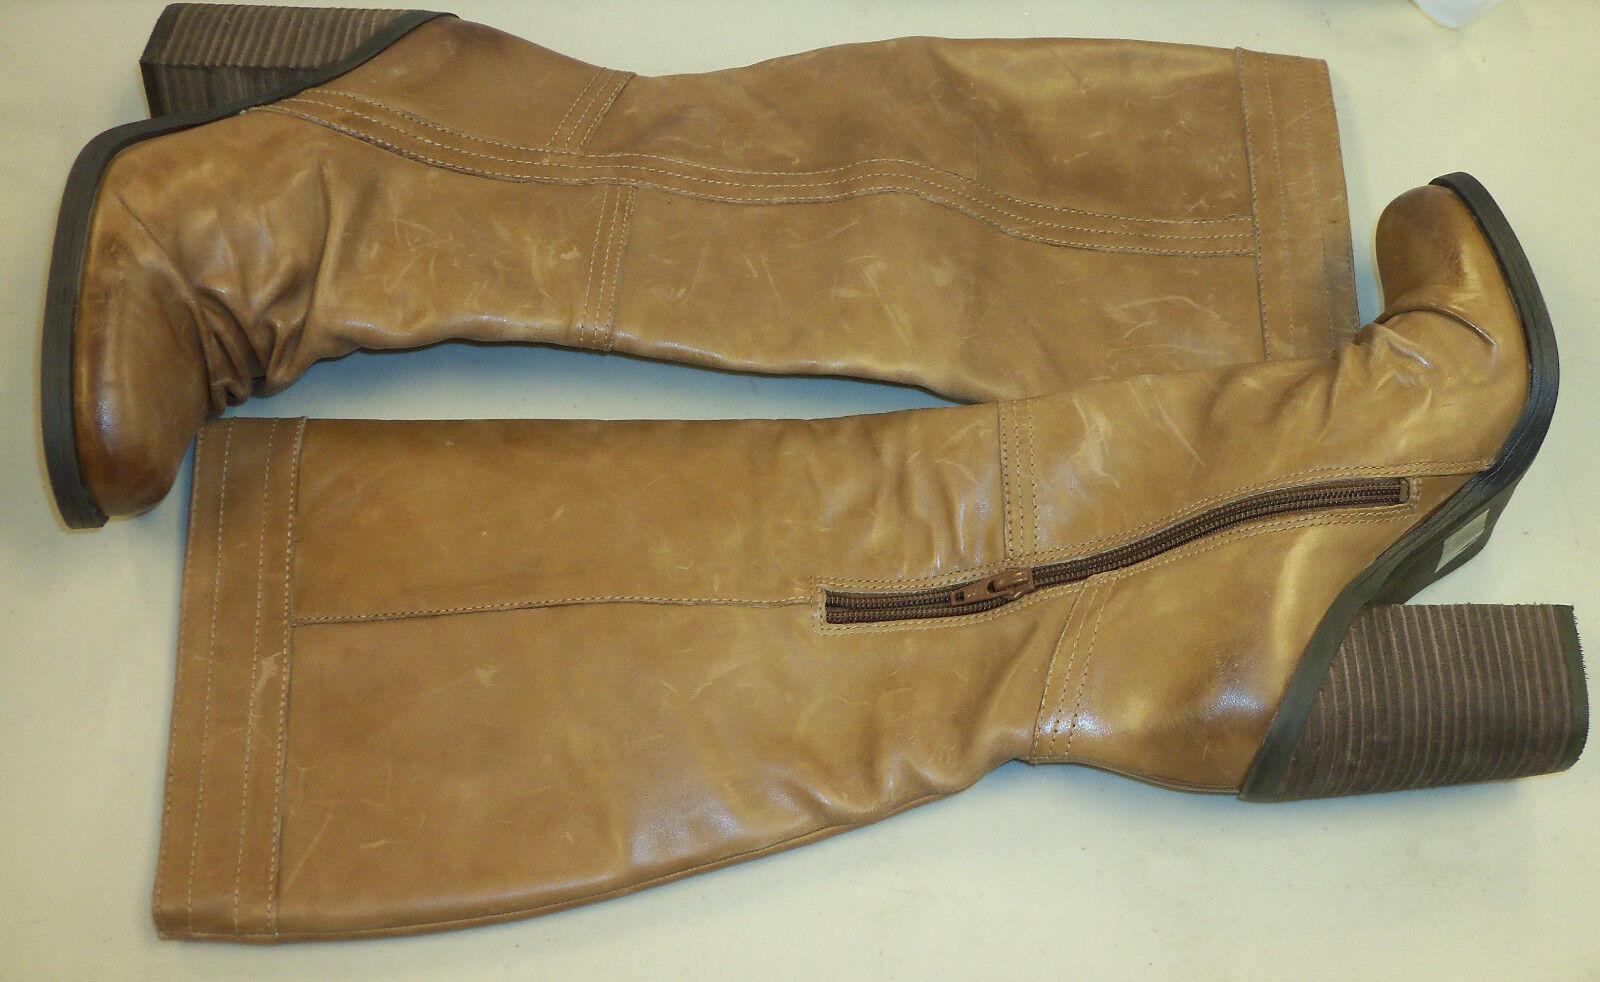 Jessica Simpson NEU Damenschuhe Tustiny Braun Stiefel 5.5 M Schuhes